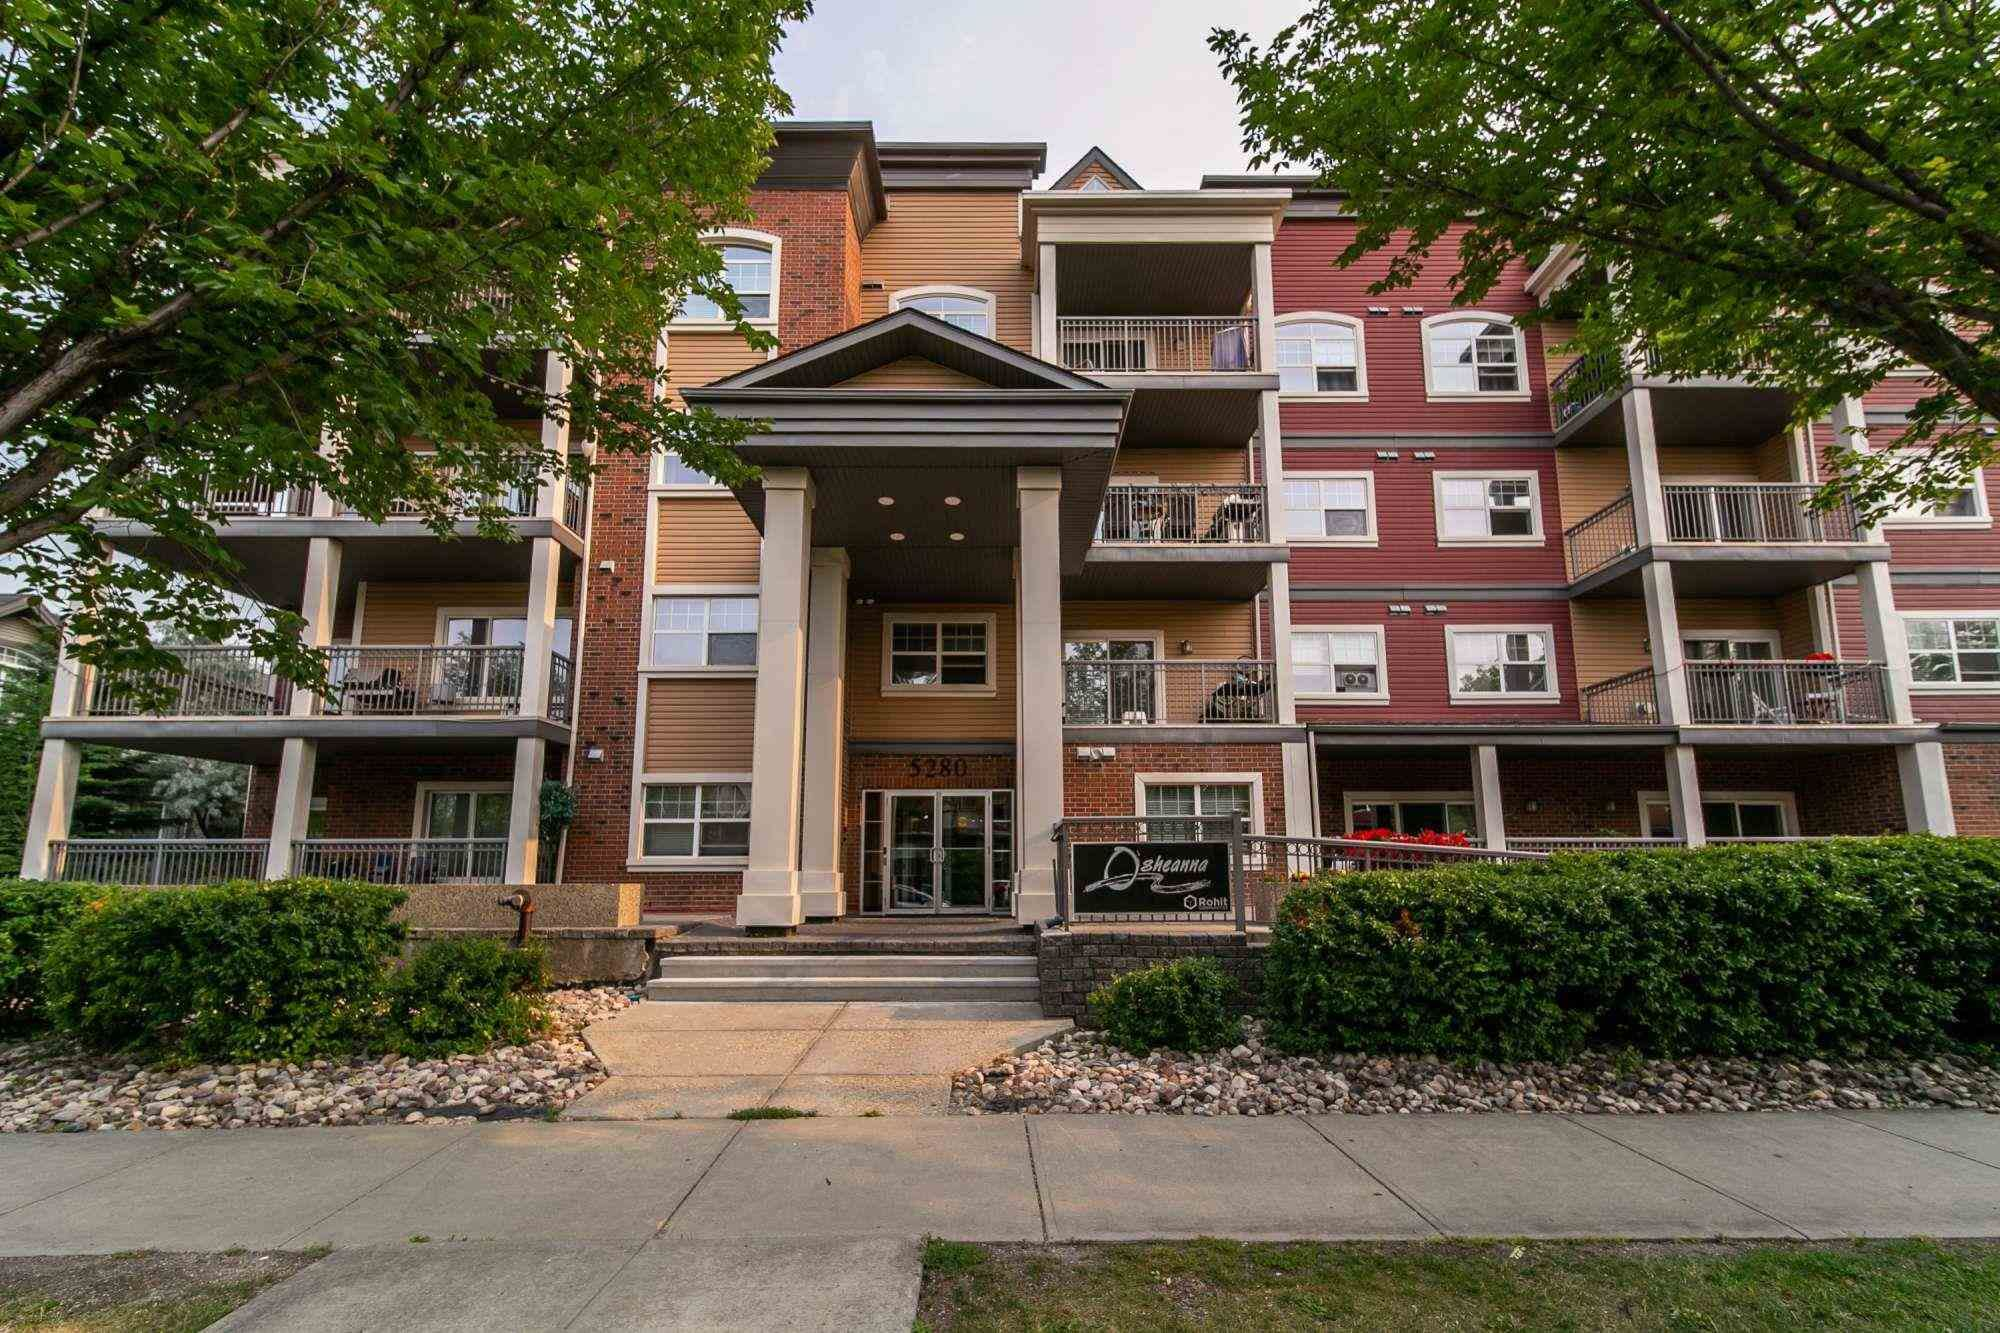 Main Photo: 314 5280 TERWILLEGAR Boulevard in Edmonton: Zone 14 Condo for sale : MLS®# E4256856